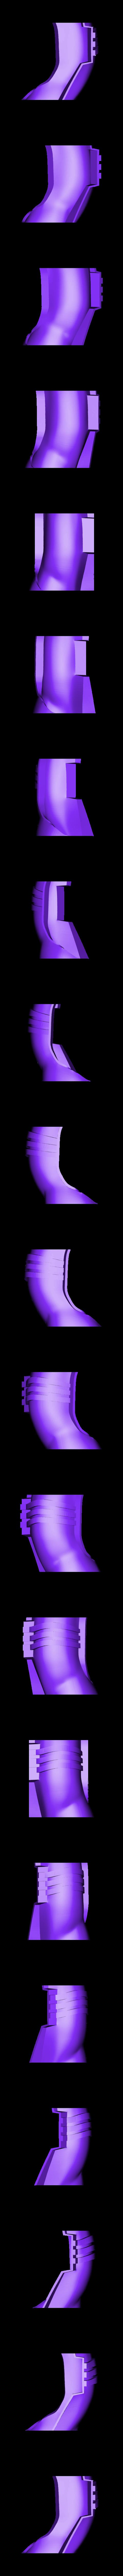 Part 17 v3.stl Download free STL file Clone Trooper Helmet Phase 2 Star Wars • 3D printable template, VillainousPropShop